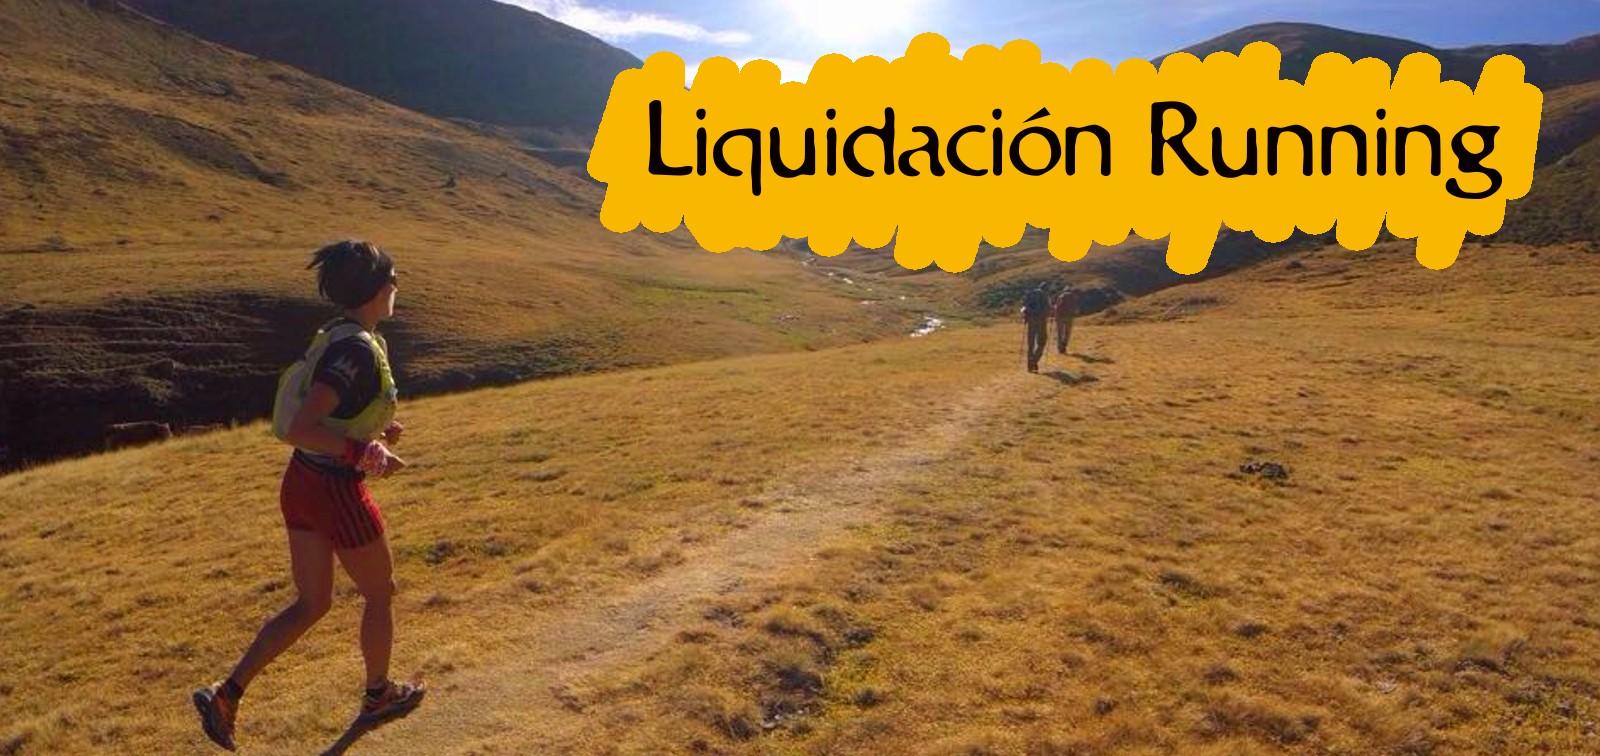 Liquidacion running